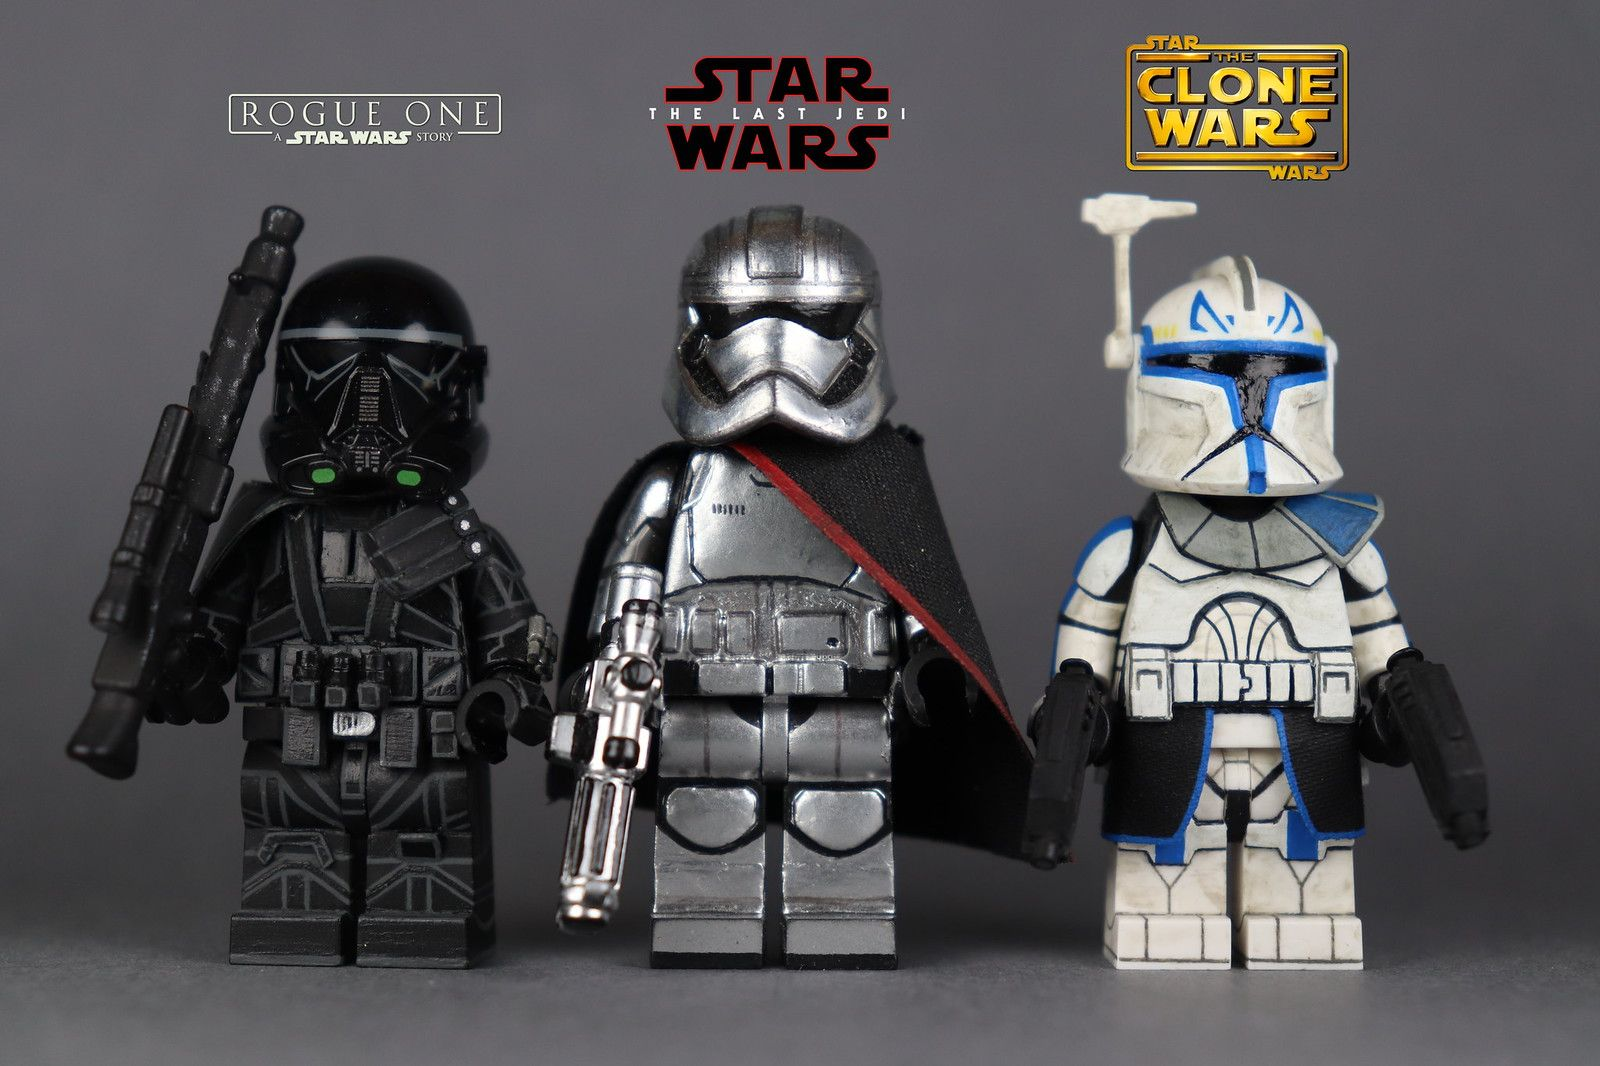 Star Wars Minifigures Darth Vader Yoda Mandalorian Clone Boba Fett Luke Figures